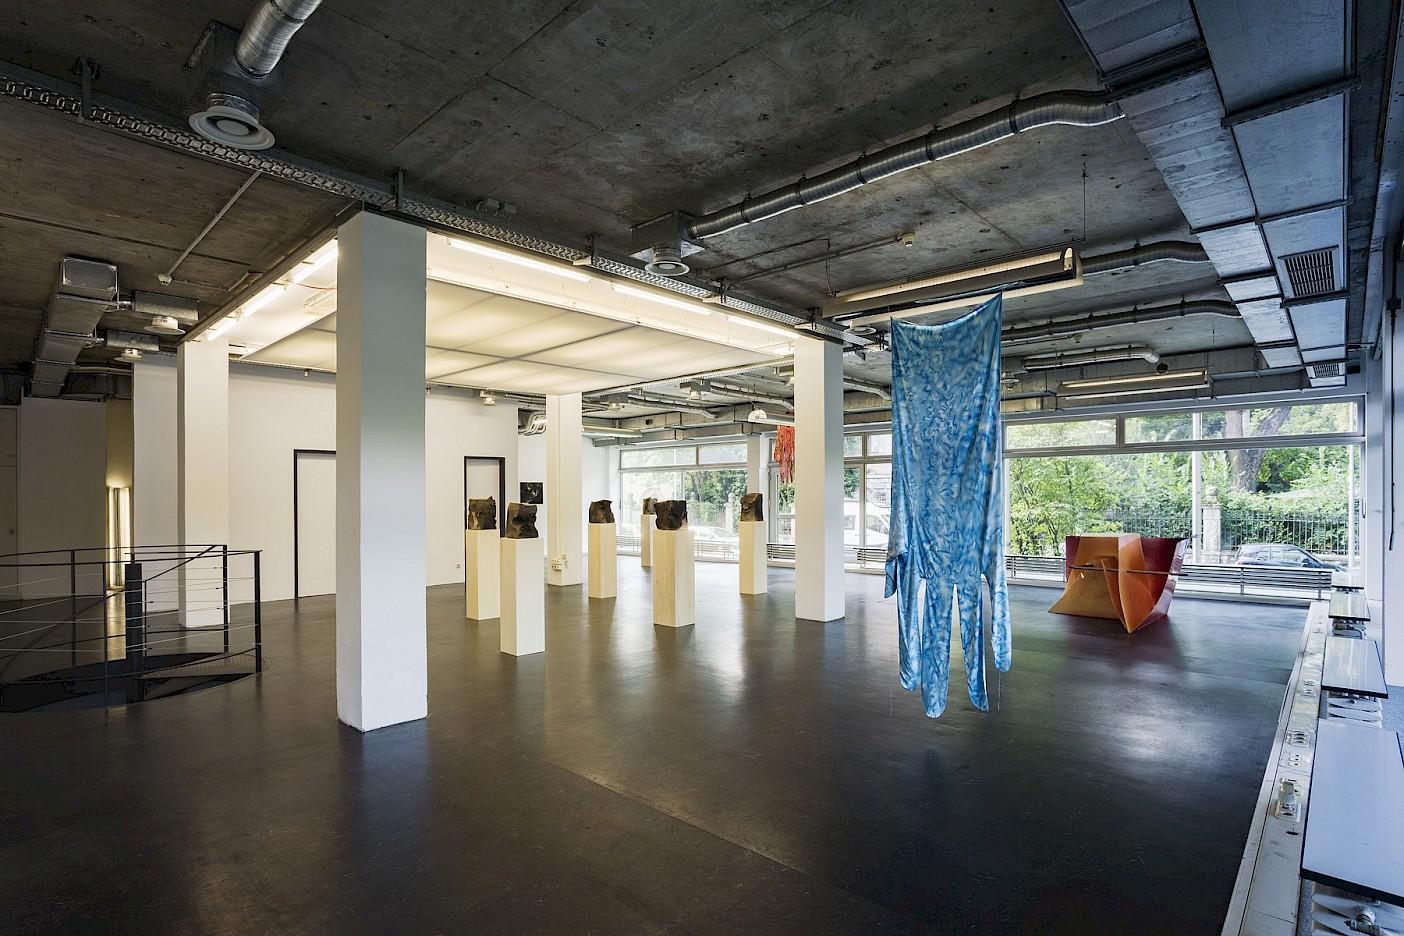 Kirstina Lovaas, Lorenz Ganthaler, installation view The Whistle, 2021, Schaumainkai 69, Foto: Ivan Murzin